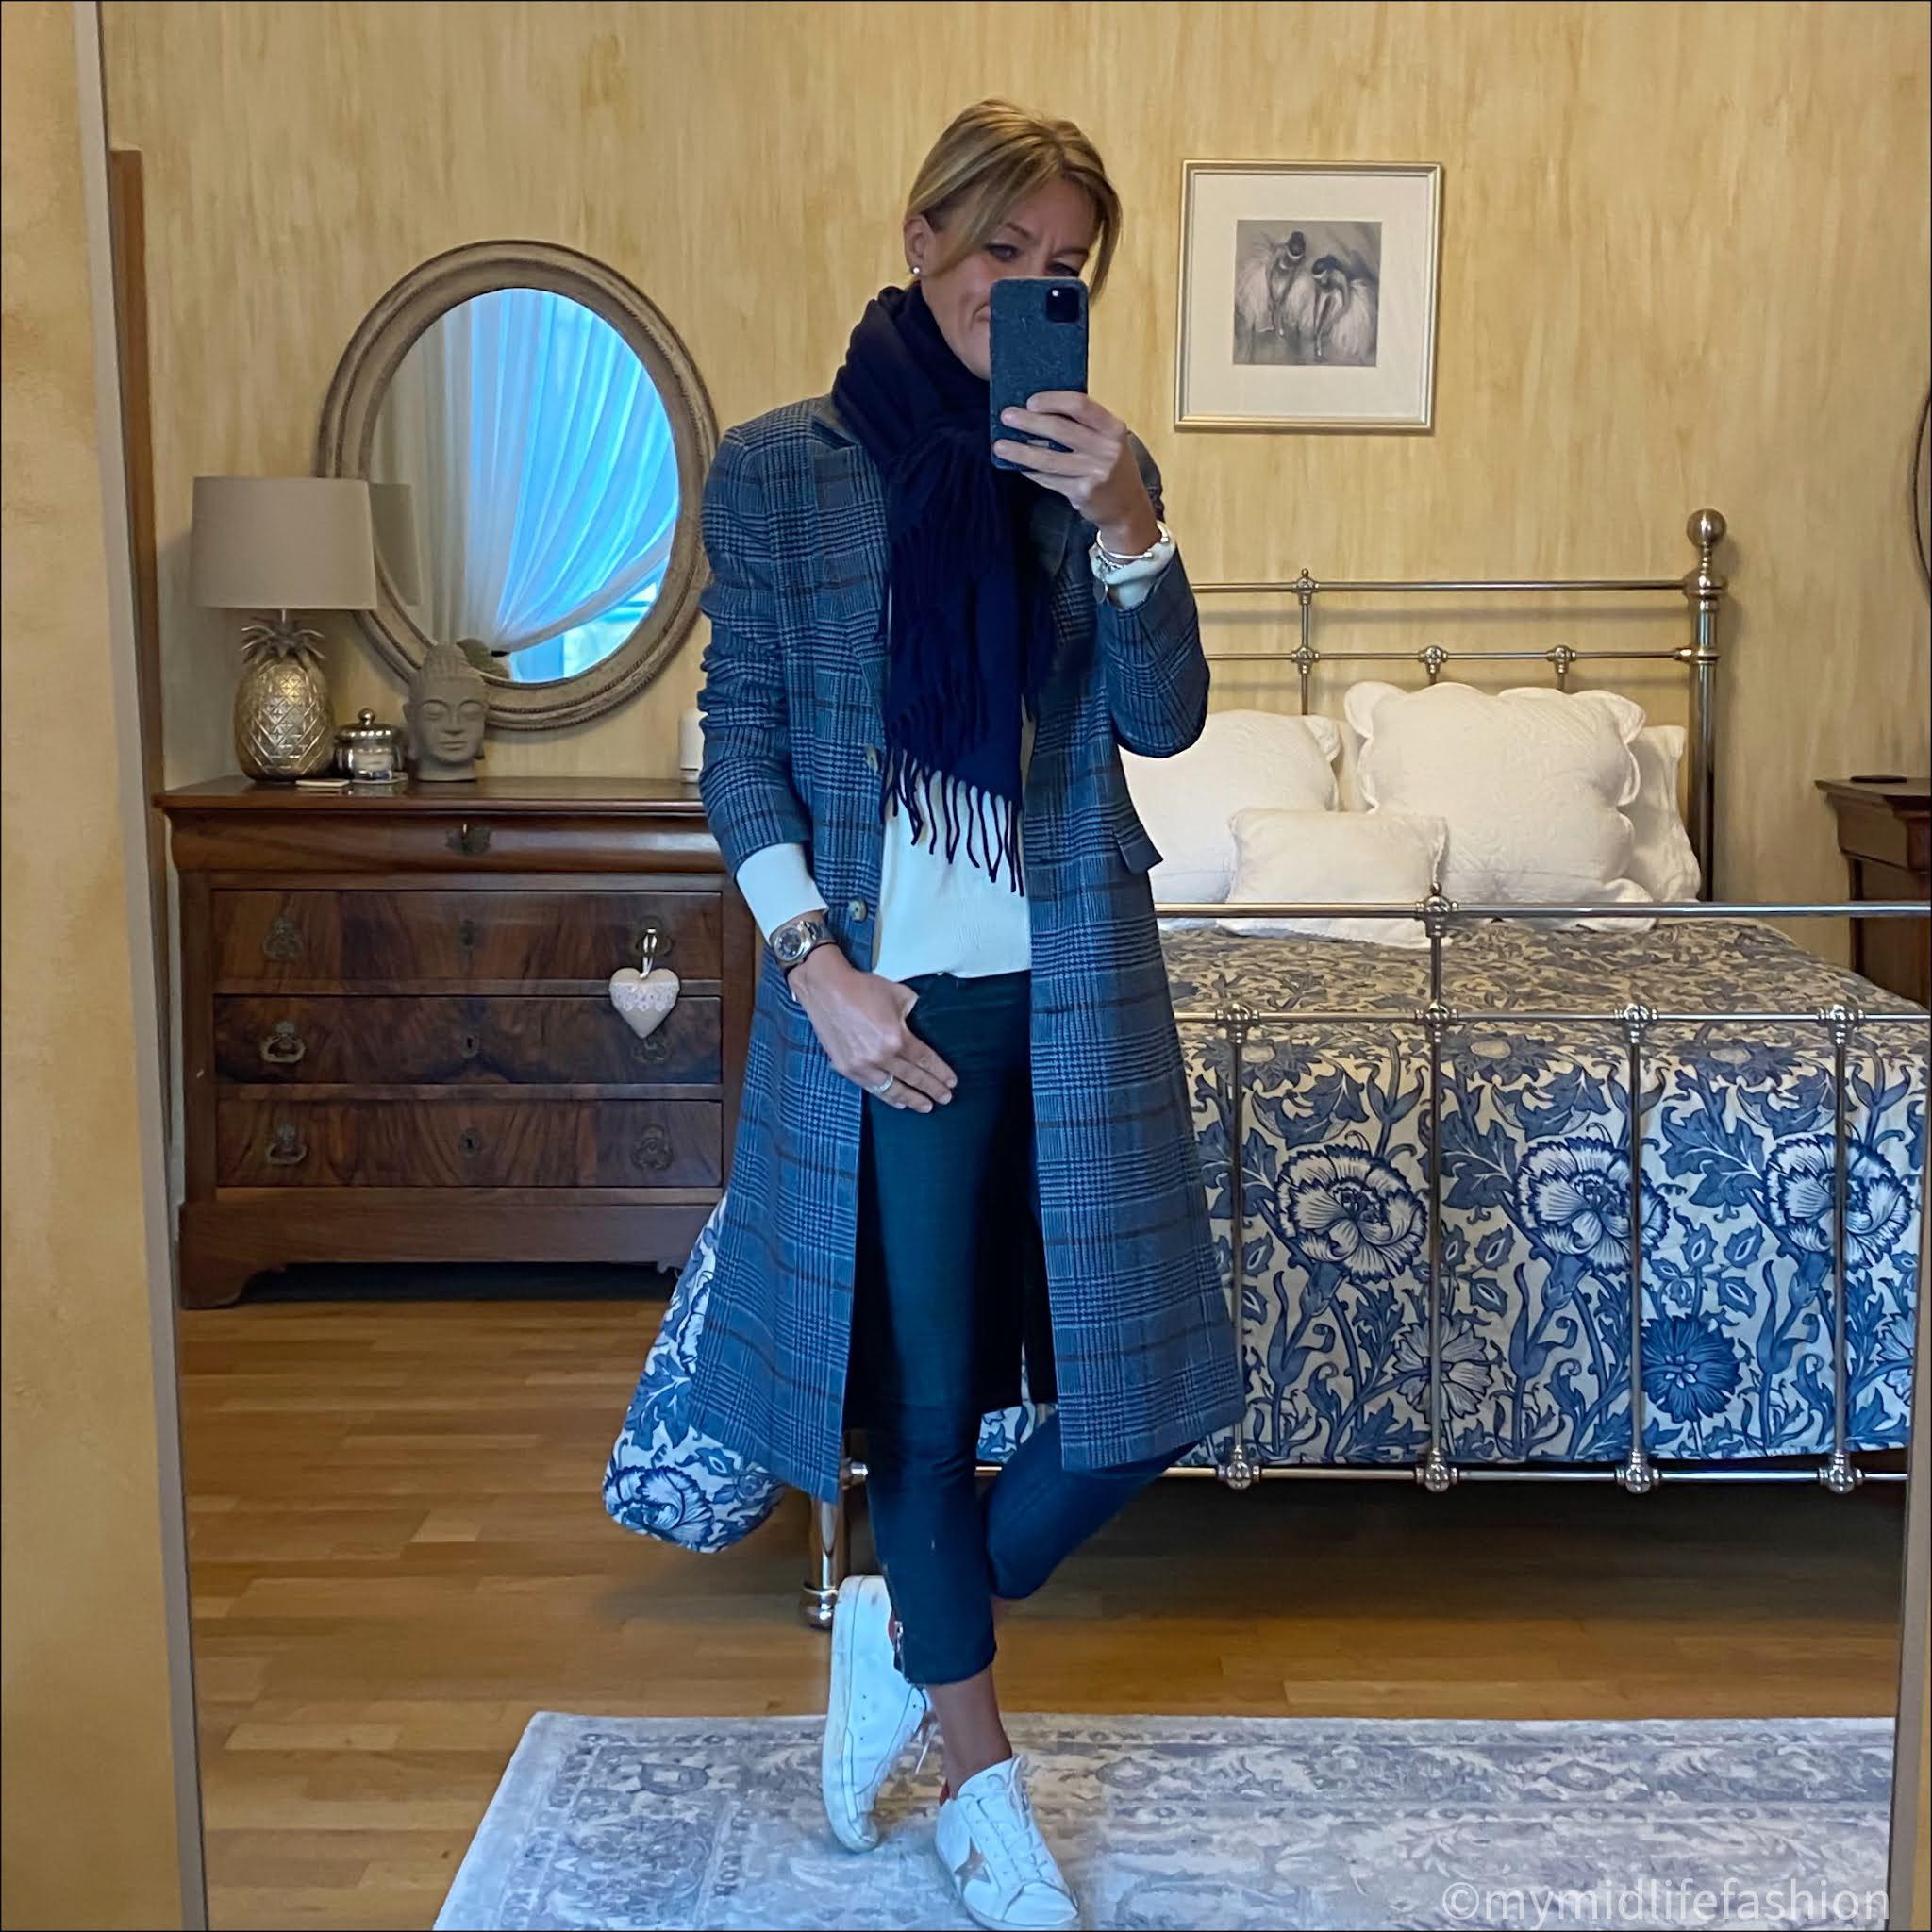 my midlife fashion, baukjen Agnes Coat, acne studios navy fringed wool scarf, marks and Spencer pure cashmere crew neck jumper, Isabel Marant Etoile biker jeans, golden goose superstar low top leather trainers